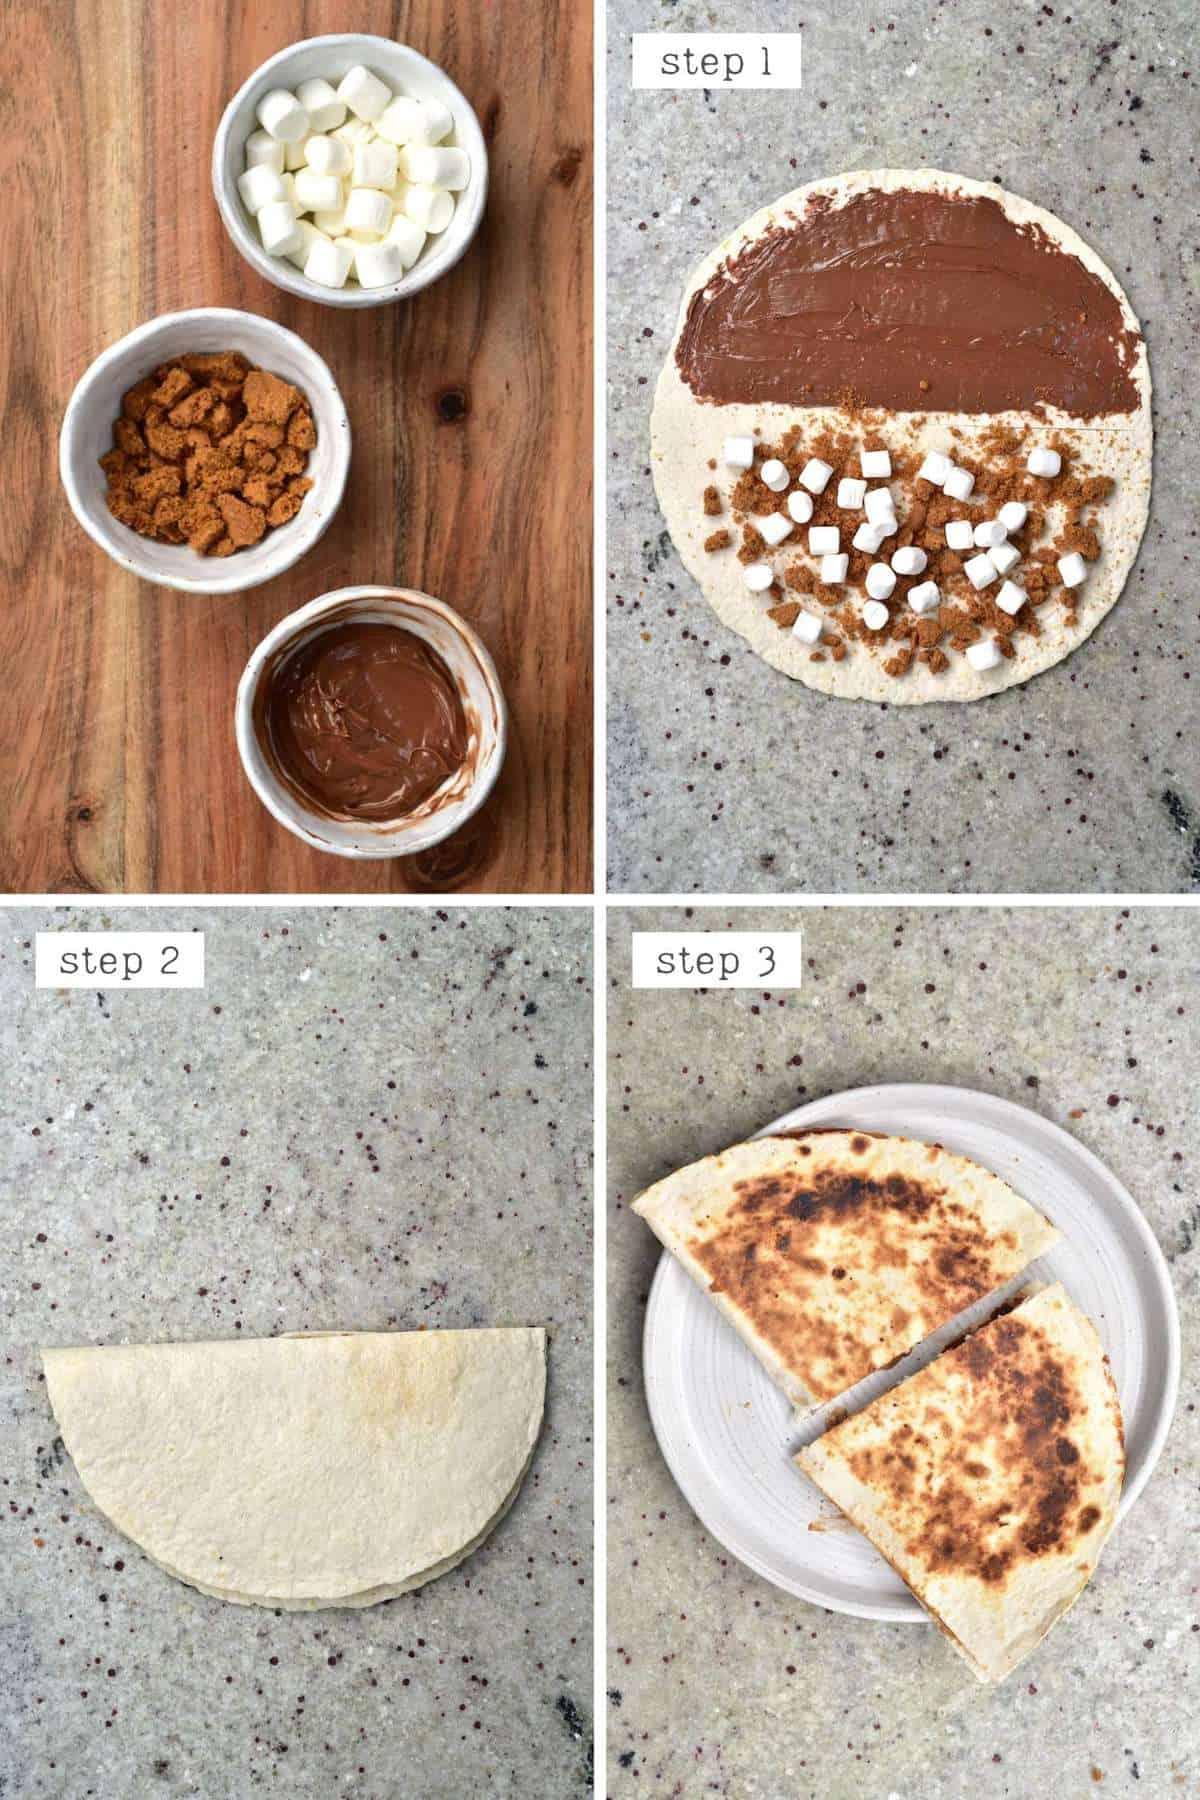 Steps for making smores tortilla